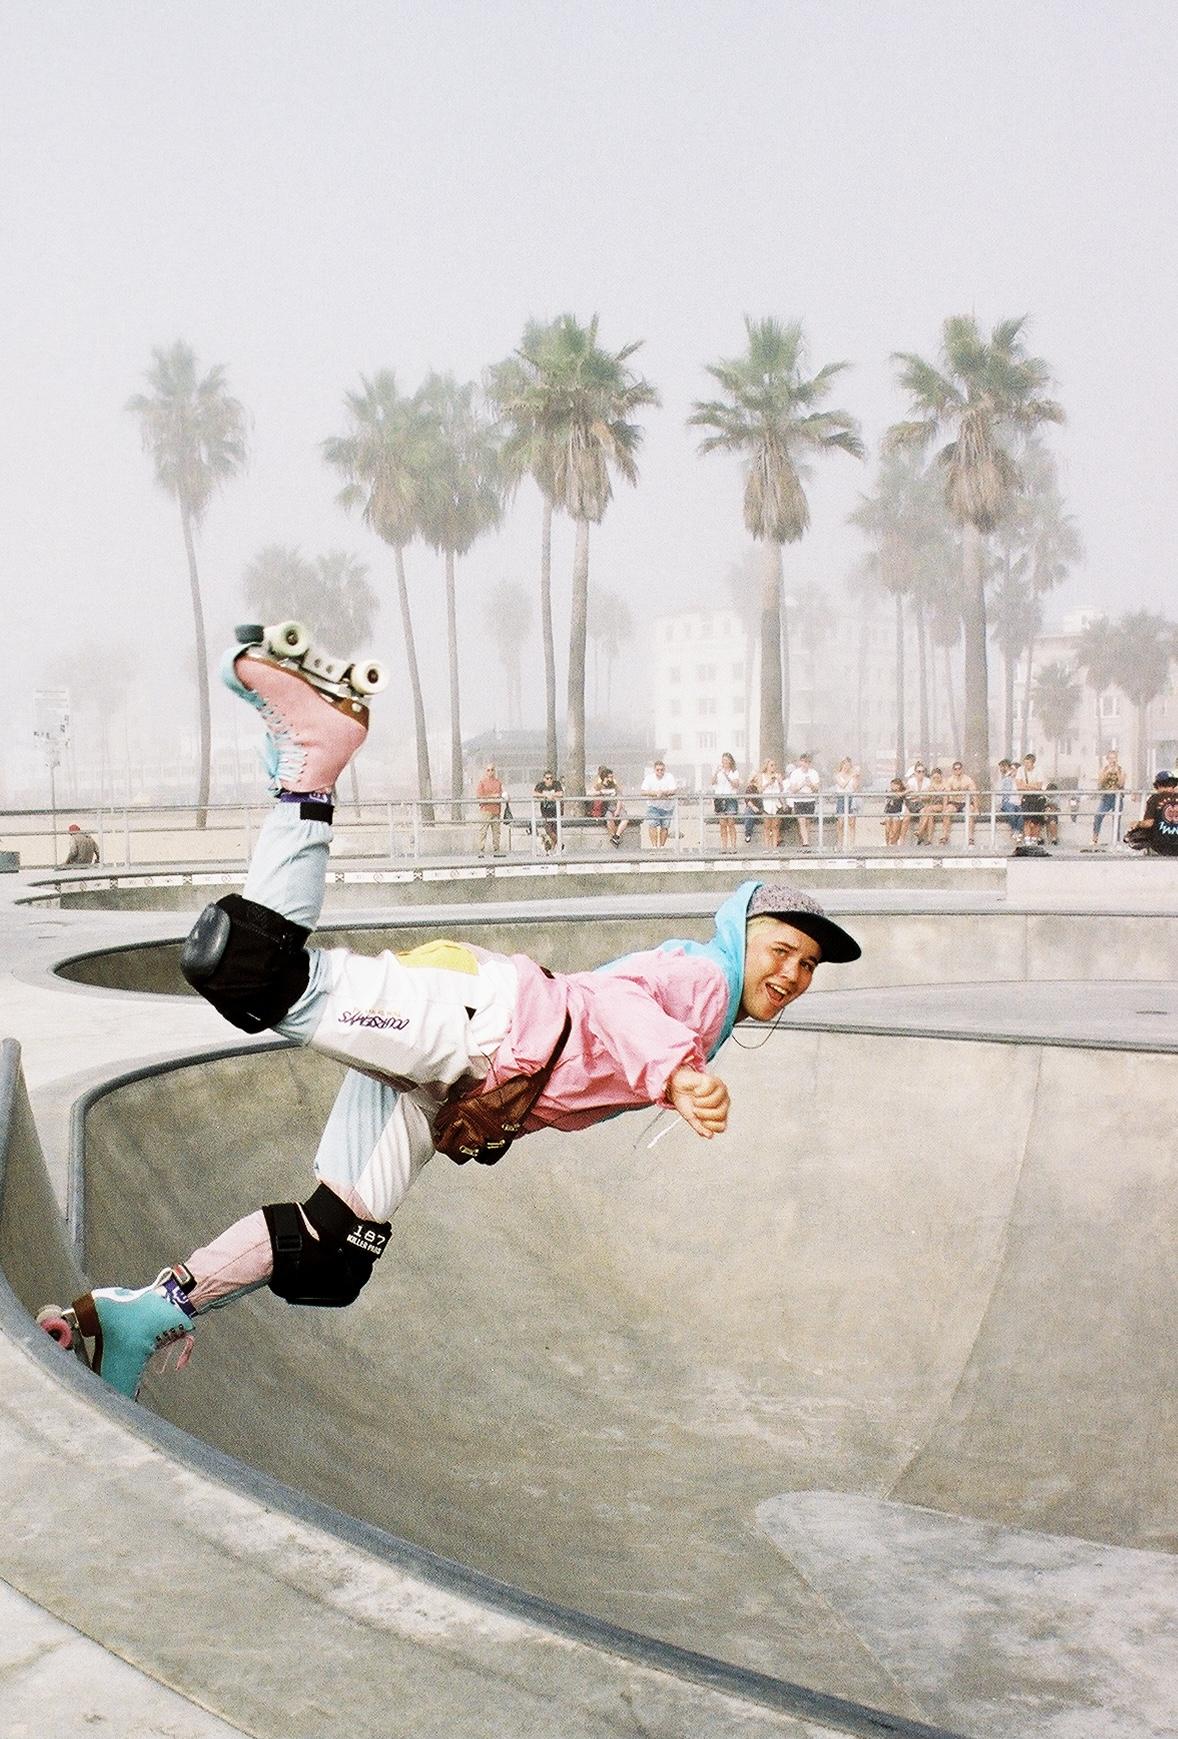 Morgan Simmons 在美国加利福尼亚州洛杉矶威尼斯海滩拍摄的一名轮滑女孩的彩色肖像照片